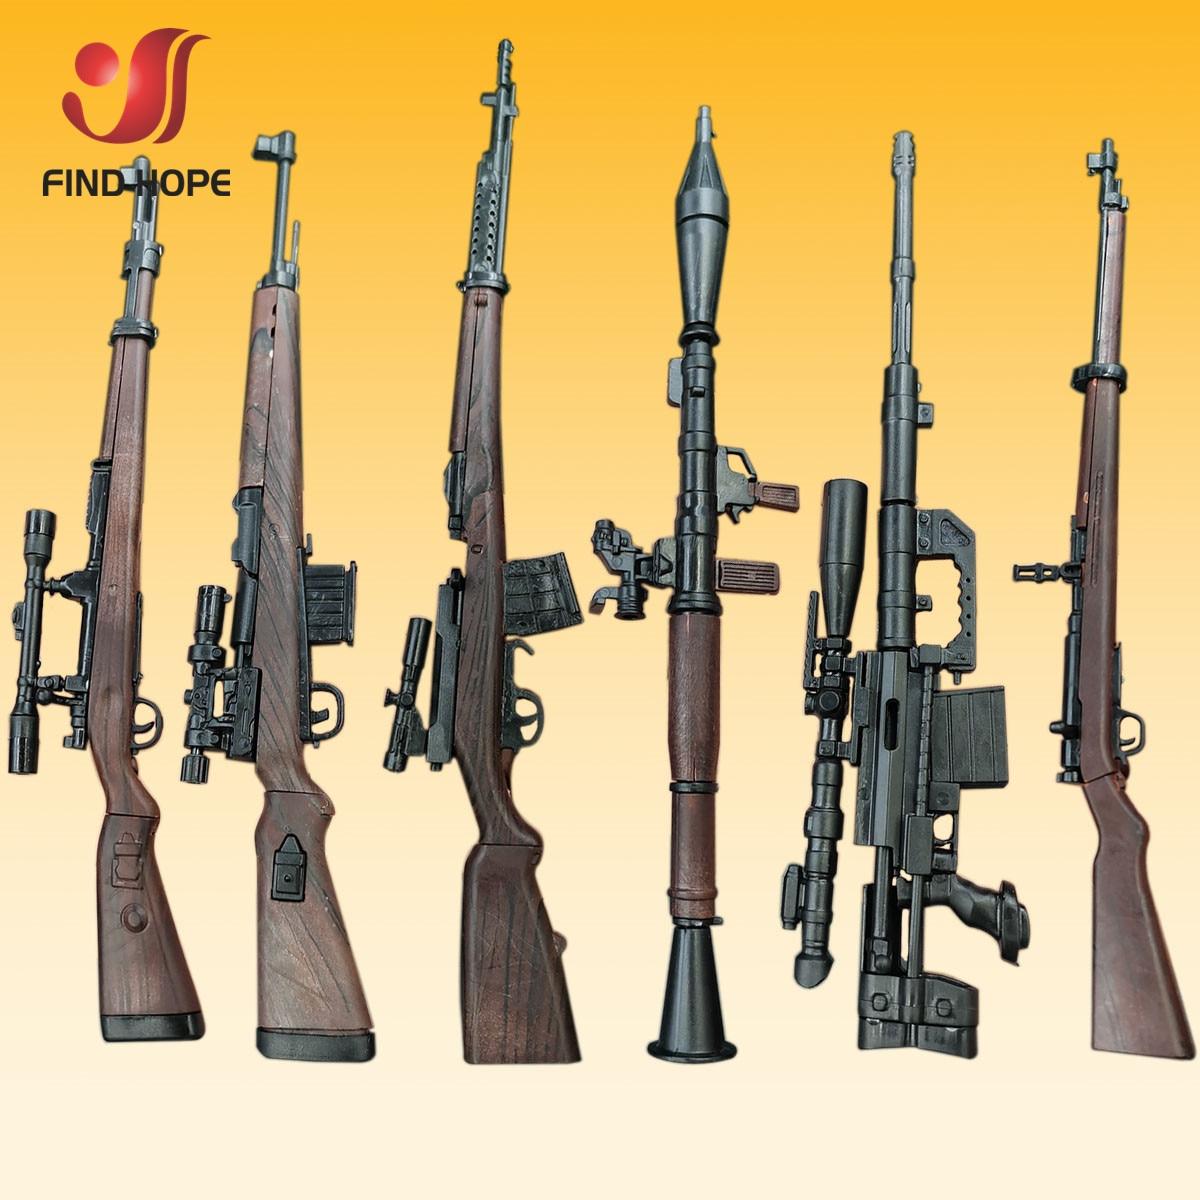 6Pcs/Set 1/6 98K RPG SVT-40 G43rifle M200 Sniper Gun Model Assembly Gun Puzzles Brick For Action Figure